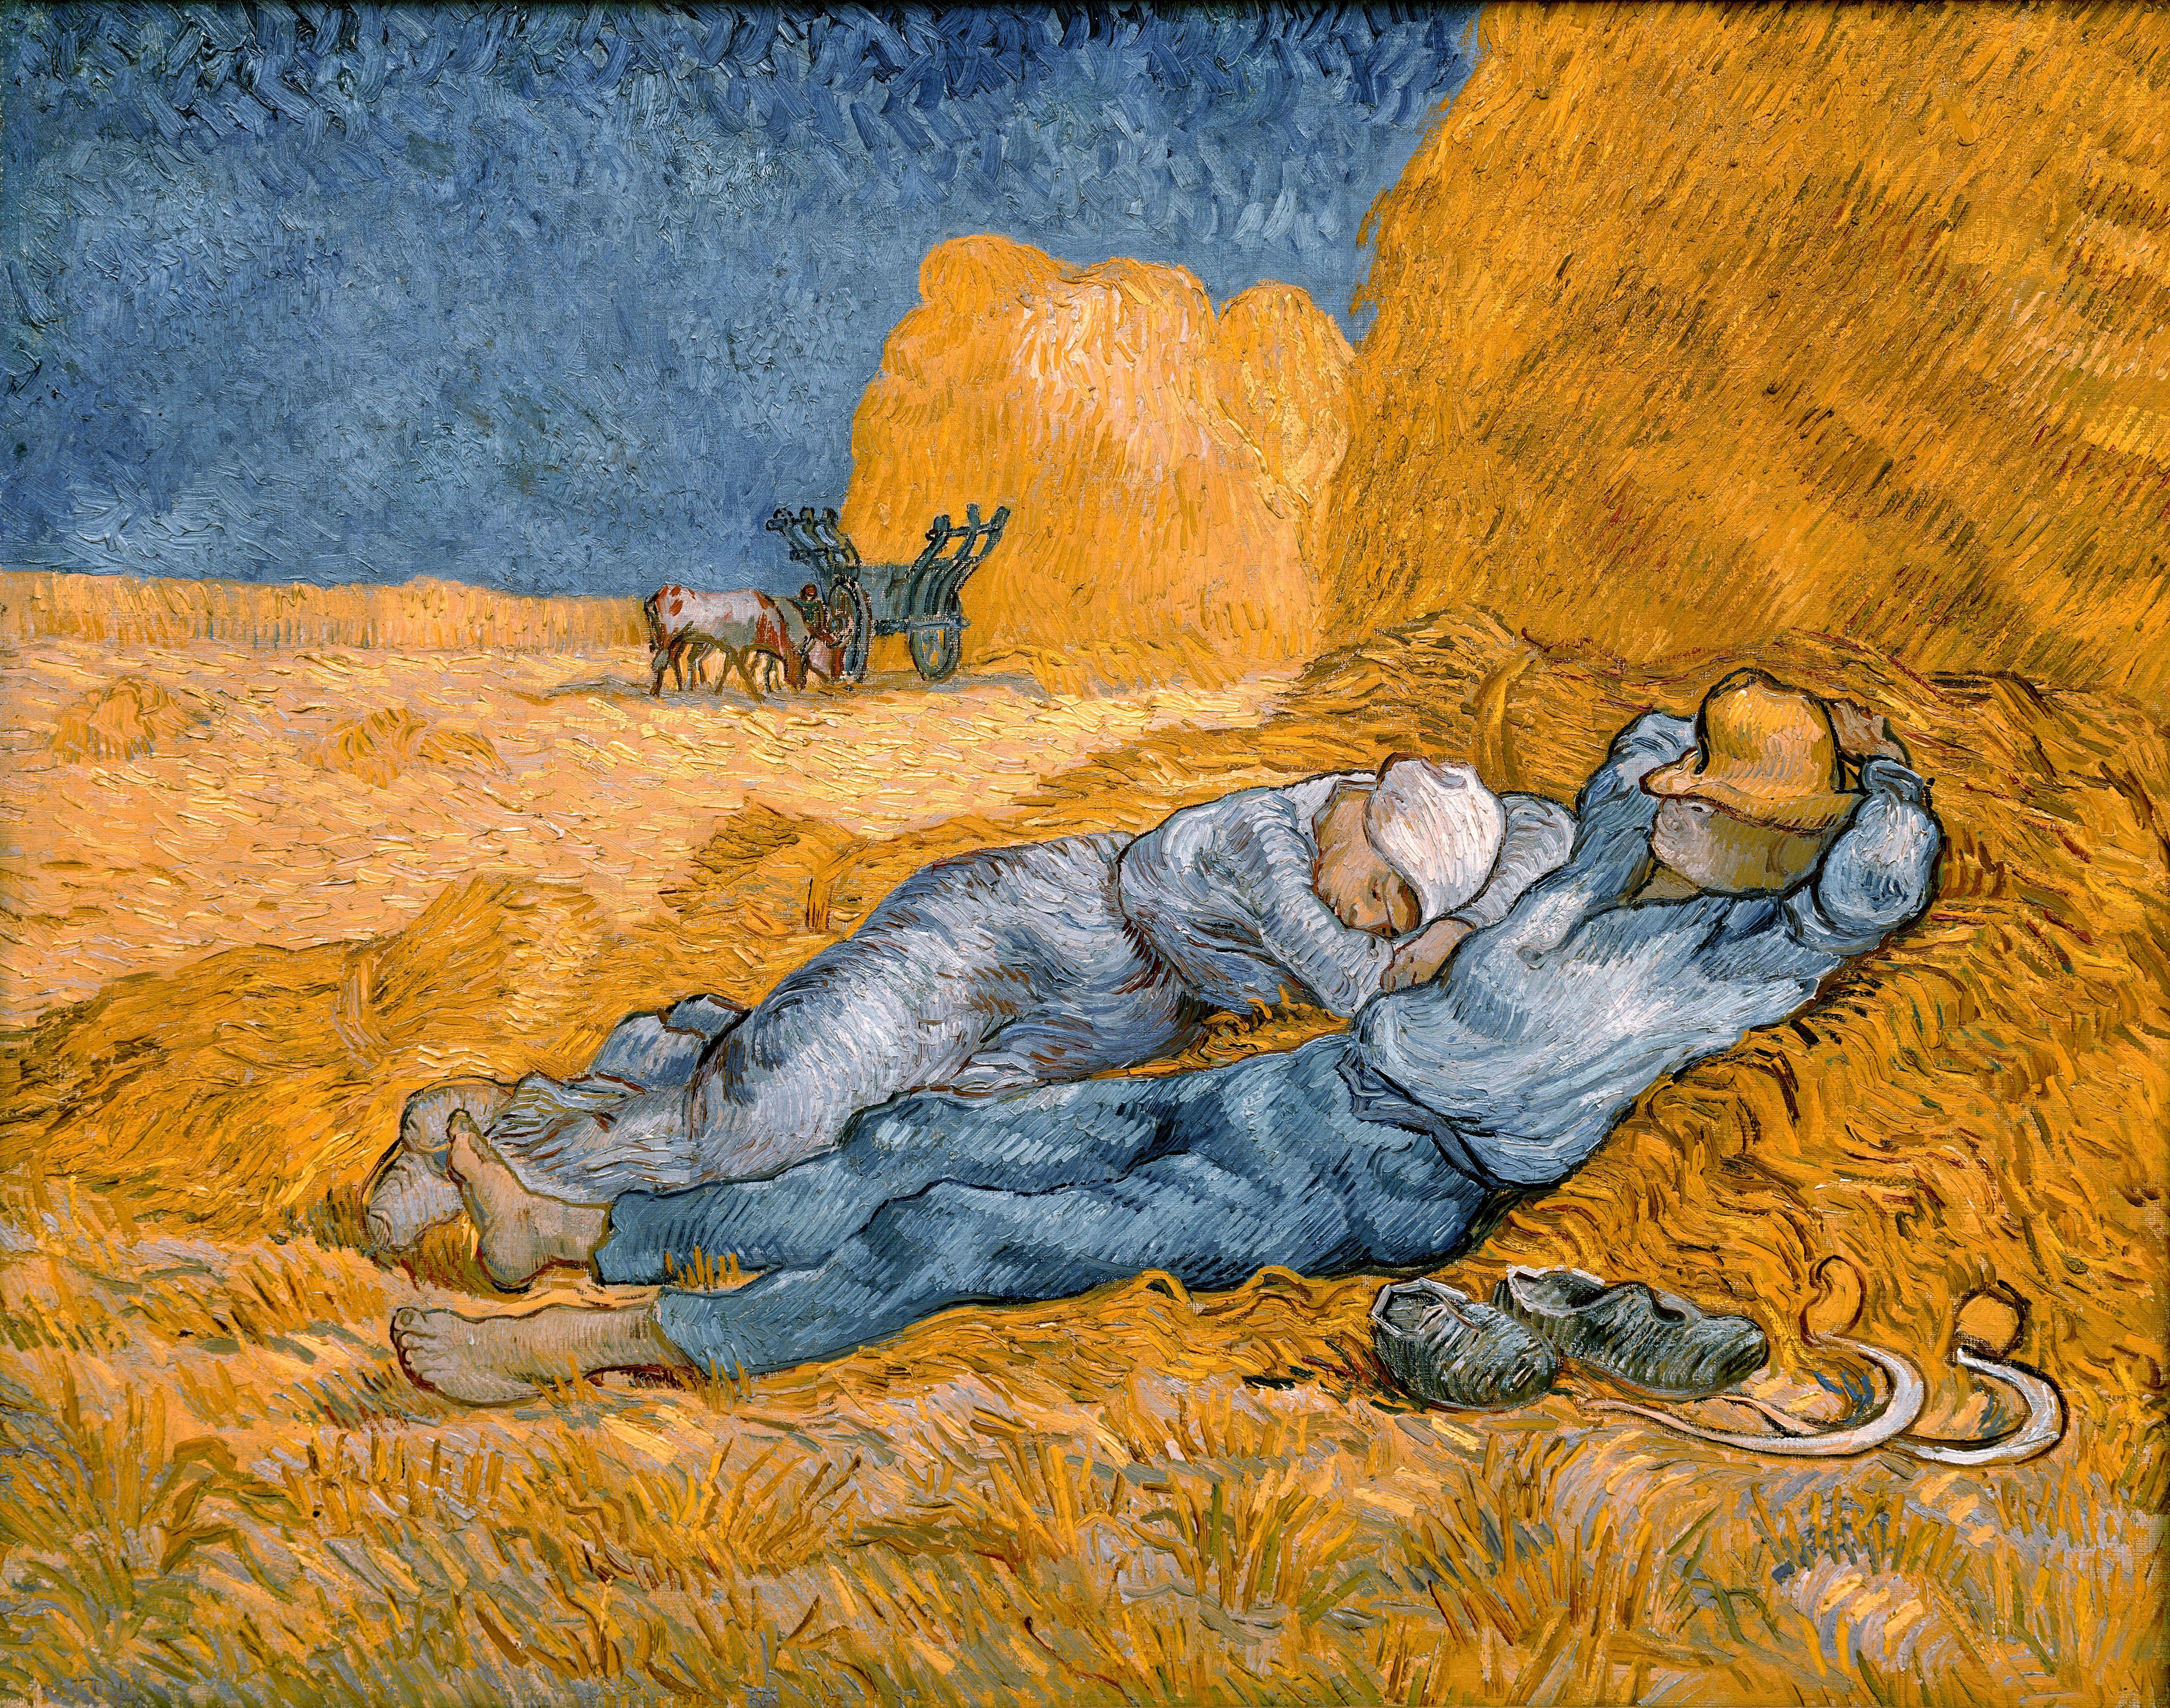 Copies By Vincent Van Gogh Wikipedia The Free Encyclopedia Van Gogh Art Vincent Van Gogh Art Vincent Van Gogh Paintings